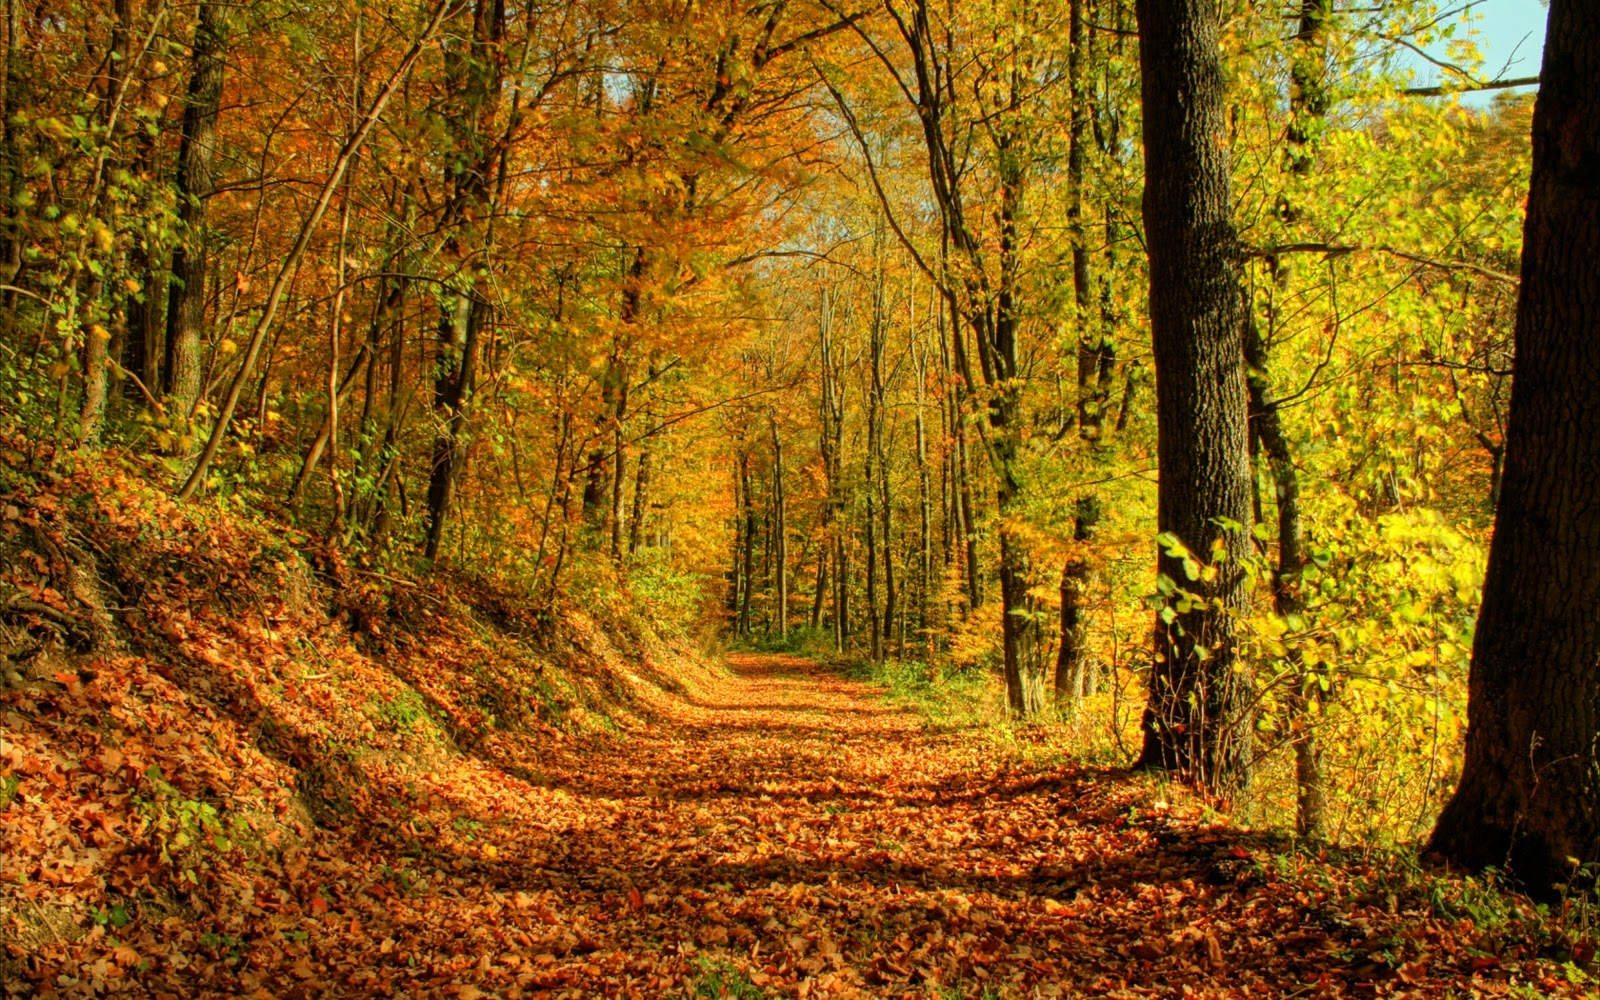 The best top autumn desktop wallpapers 37 En Güzel Sonbahar HD Duvar Kağıtları